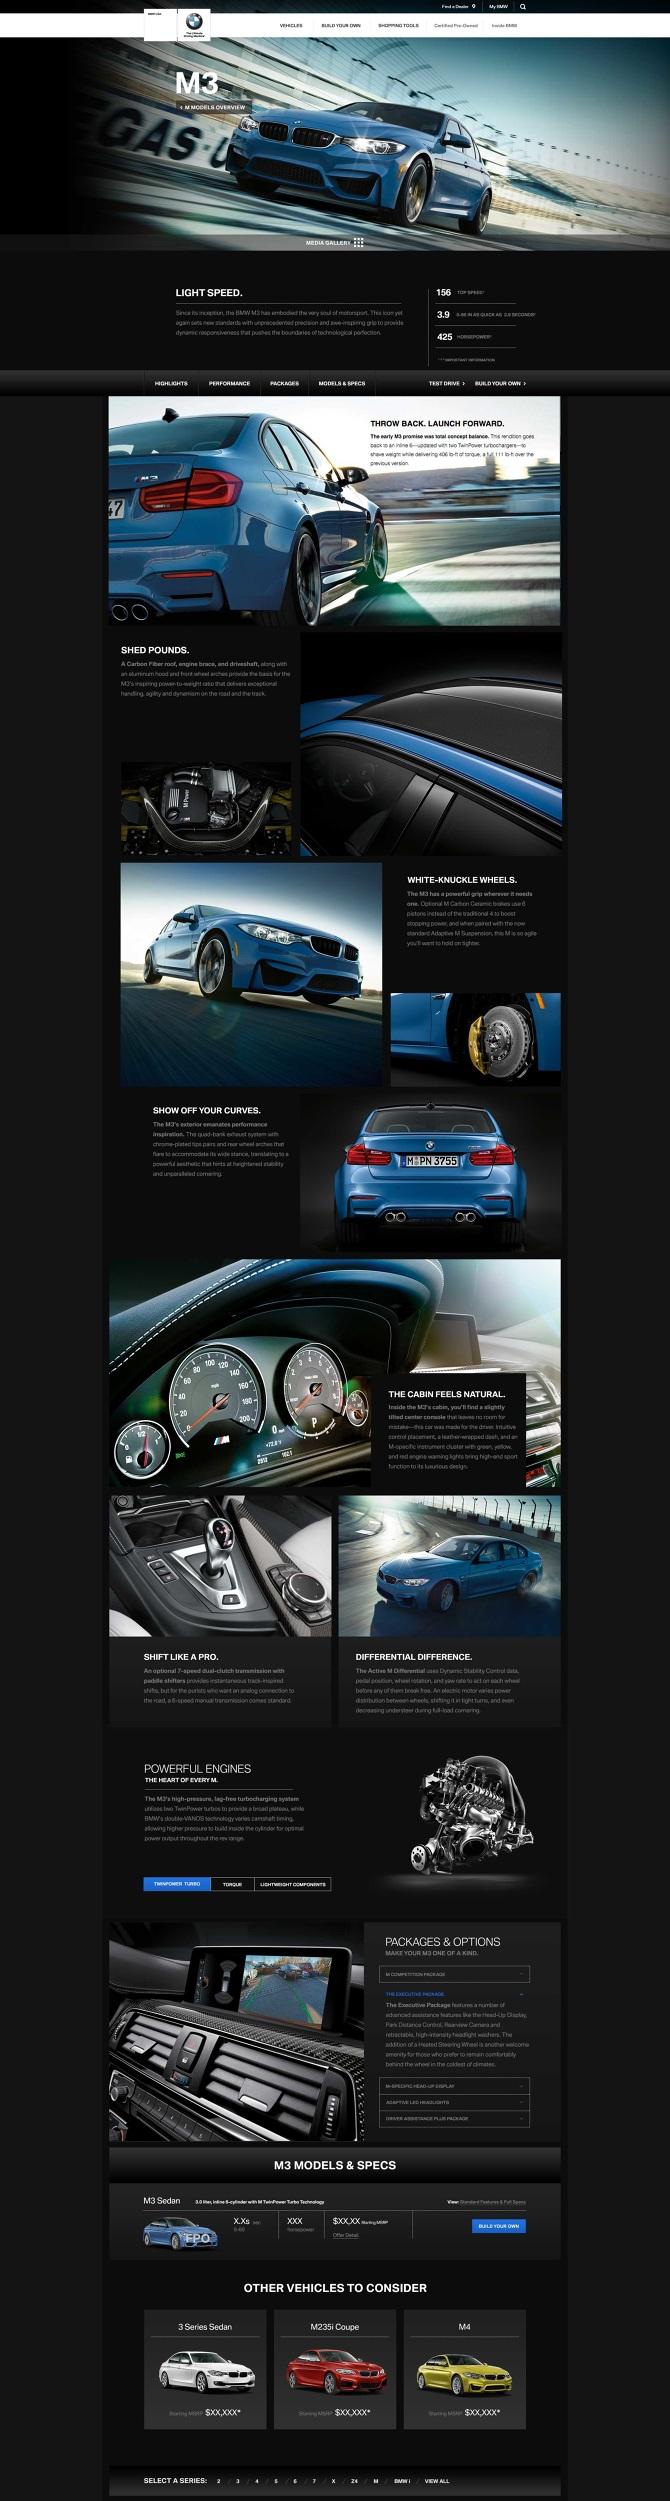 BMWRedesign_P2_M3_20151303_670.jpg